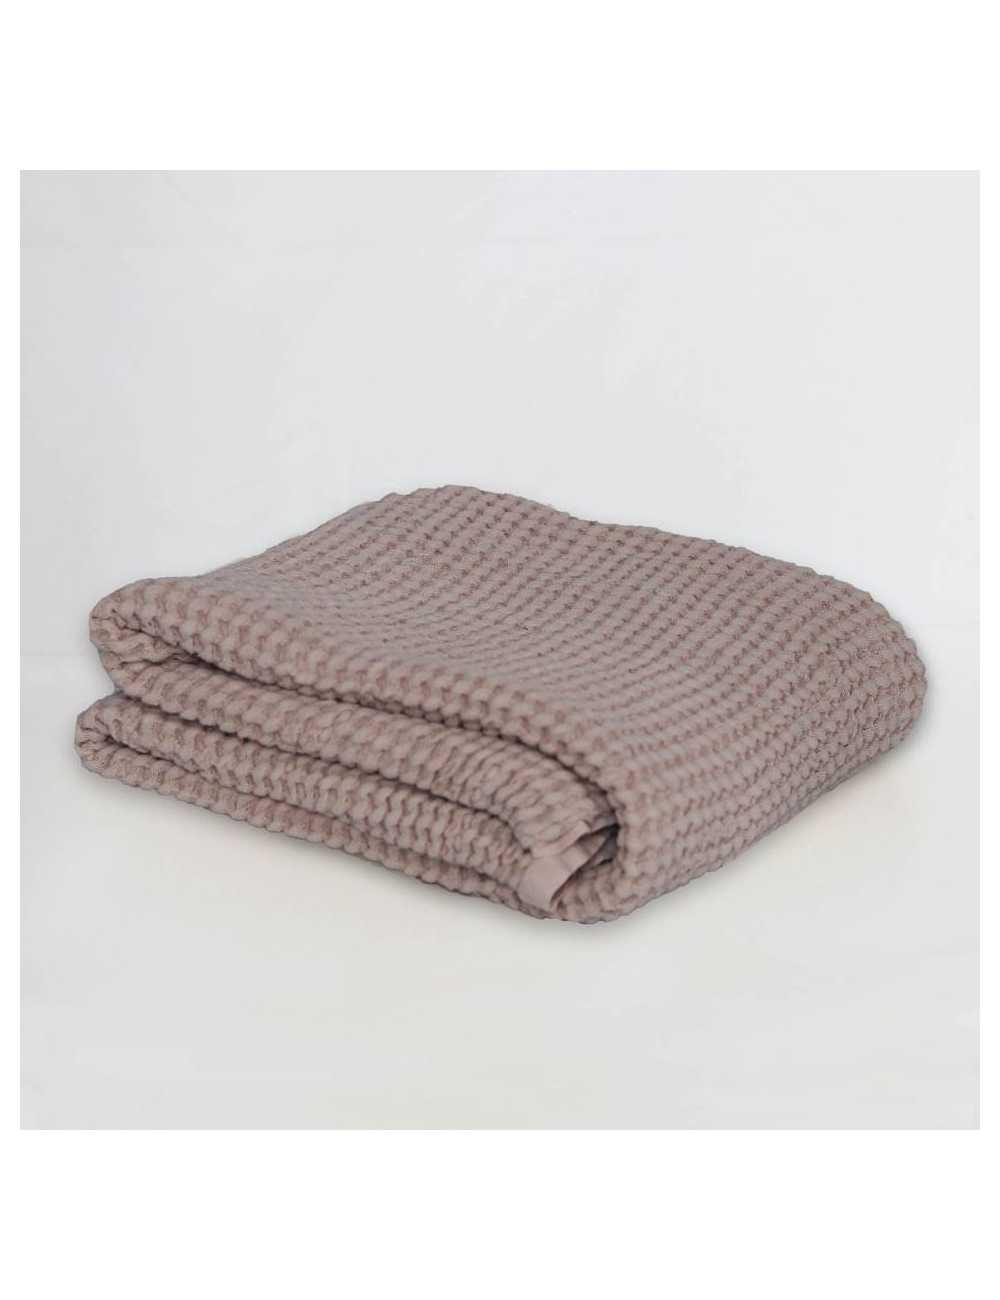 Mallino waffle blanket | powder pinktest